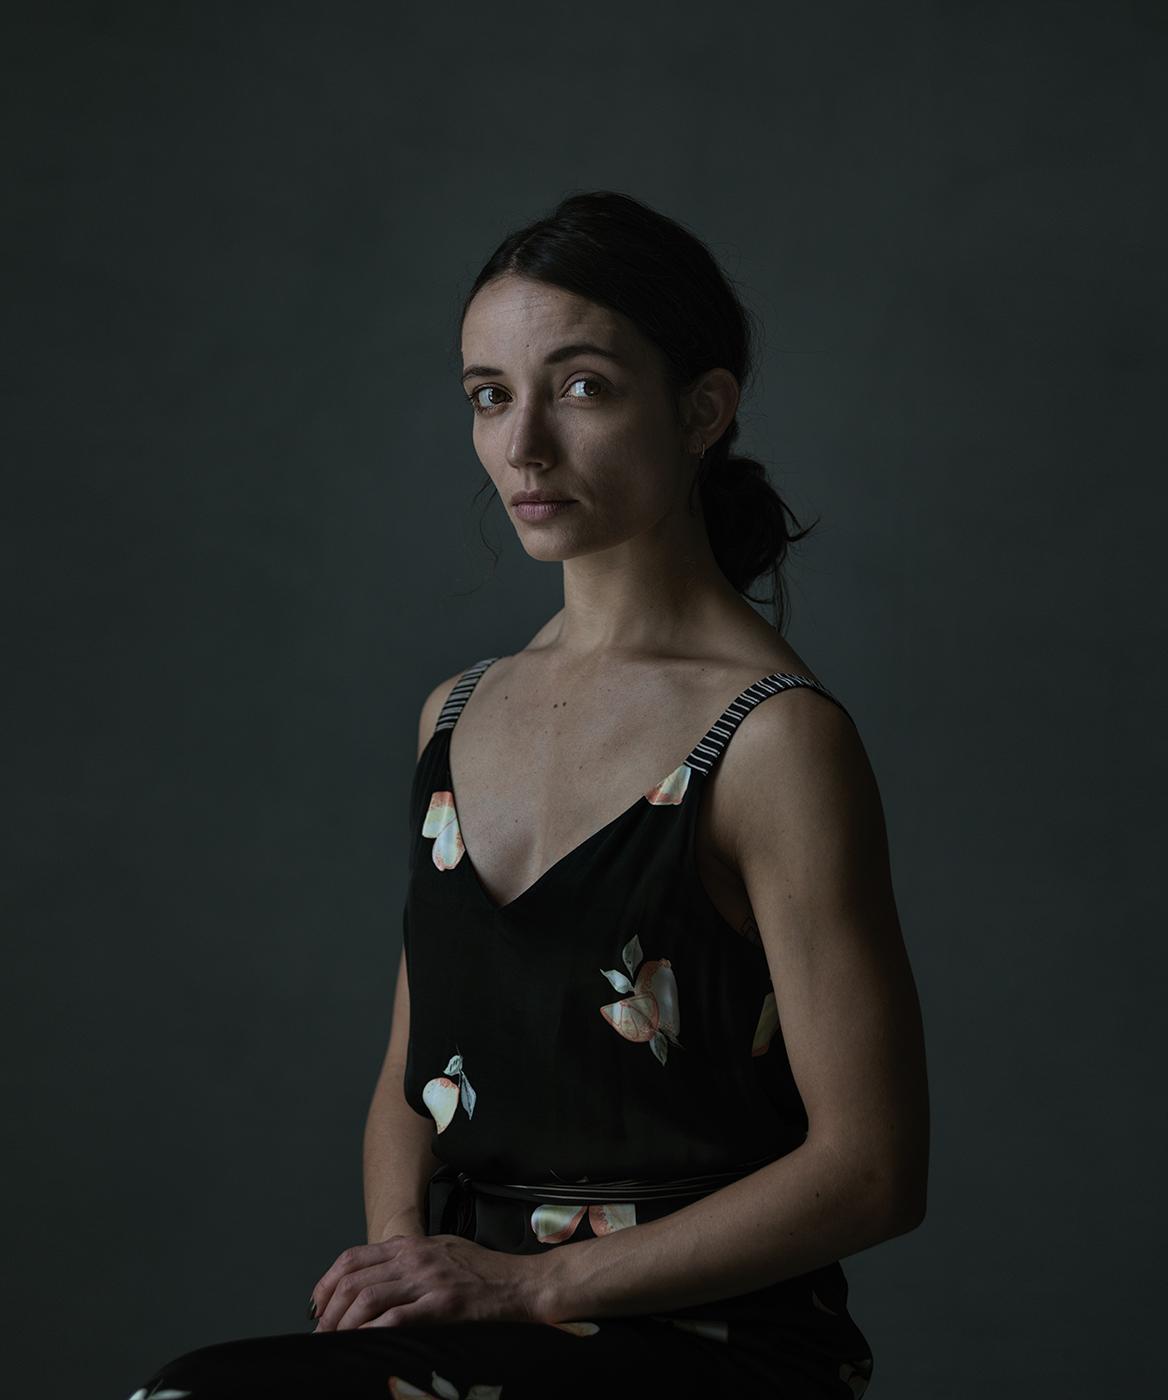 portrait, portret, portretfotografie, dance, danser, dans danseres, Susanne Middelberg